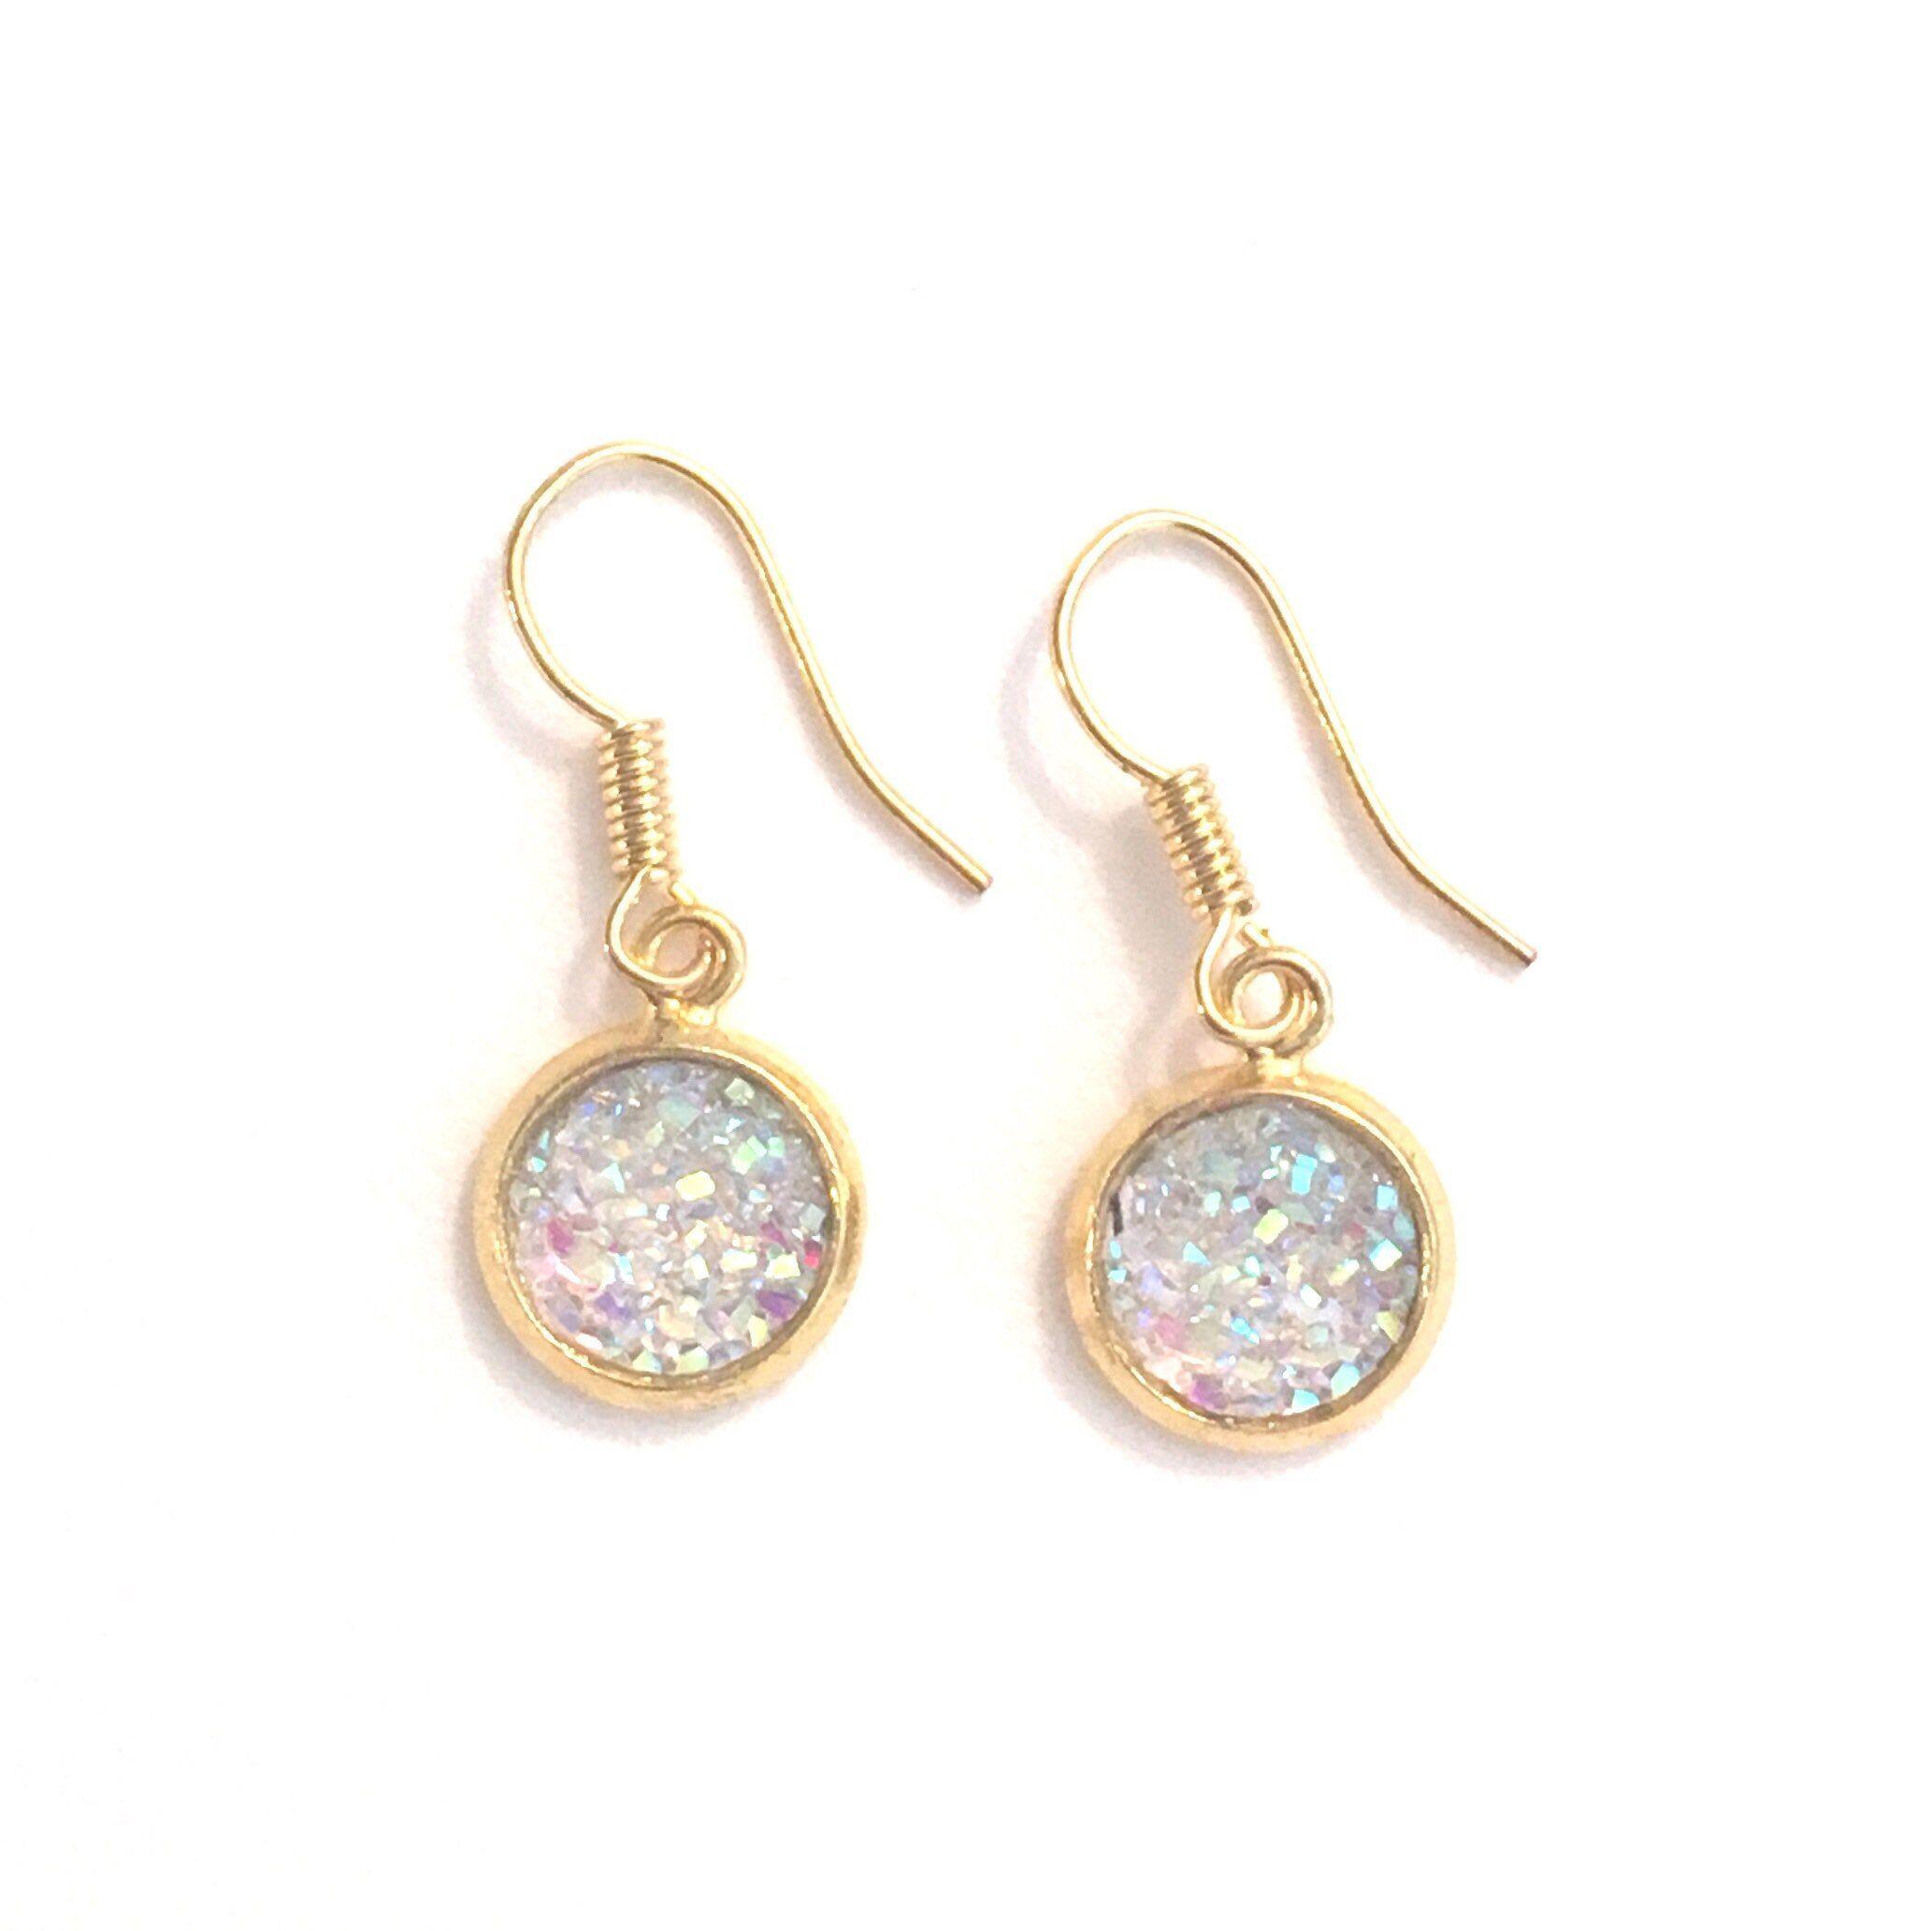 Blue Druzy Crystal Earrings Turquoise earrings Silver or Gold Earrings Bridesmaid gift beach wedding jewelry Crystals earrings Canada